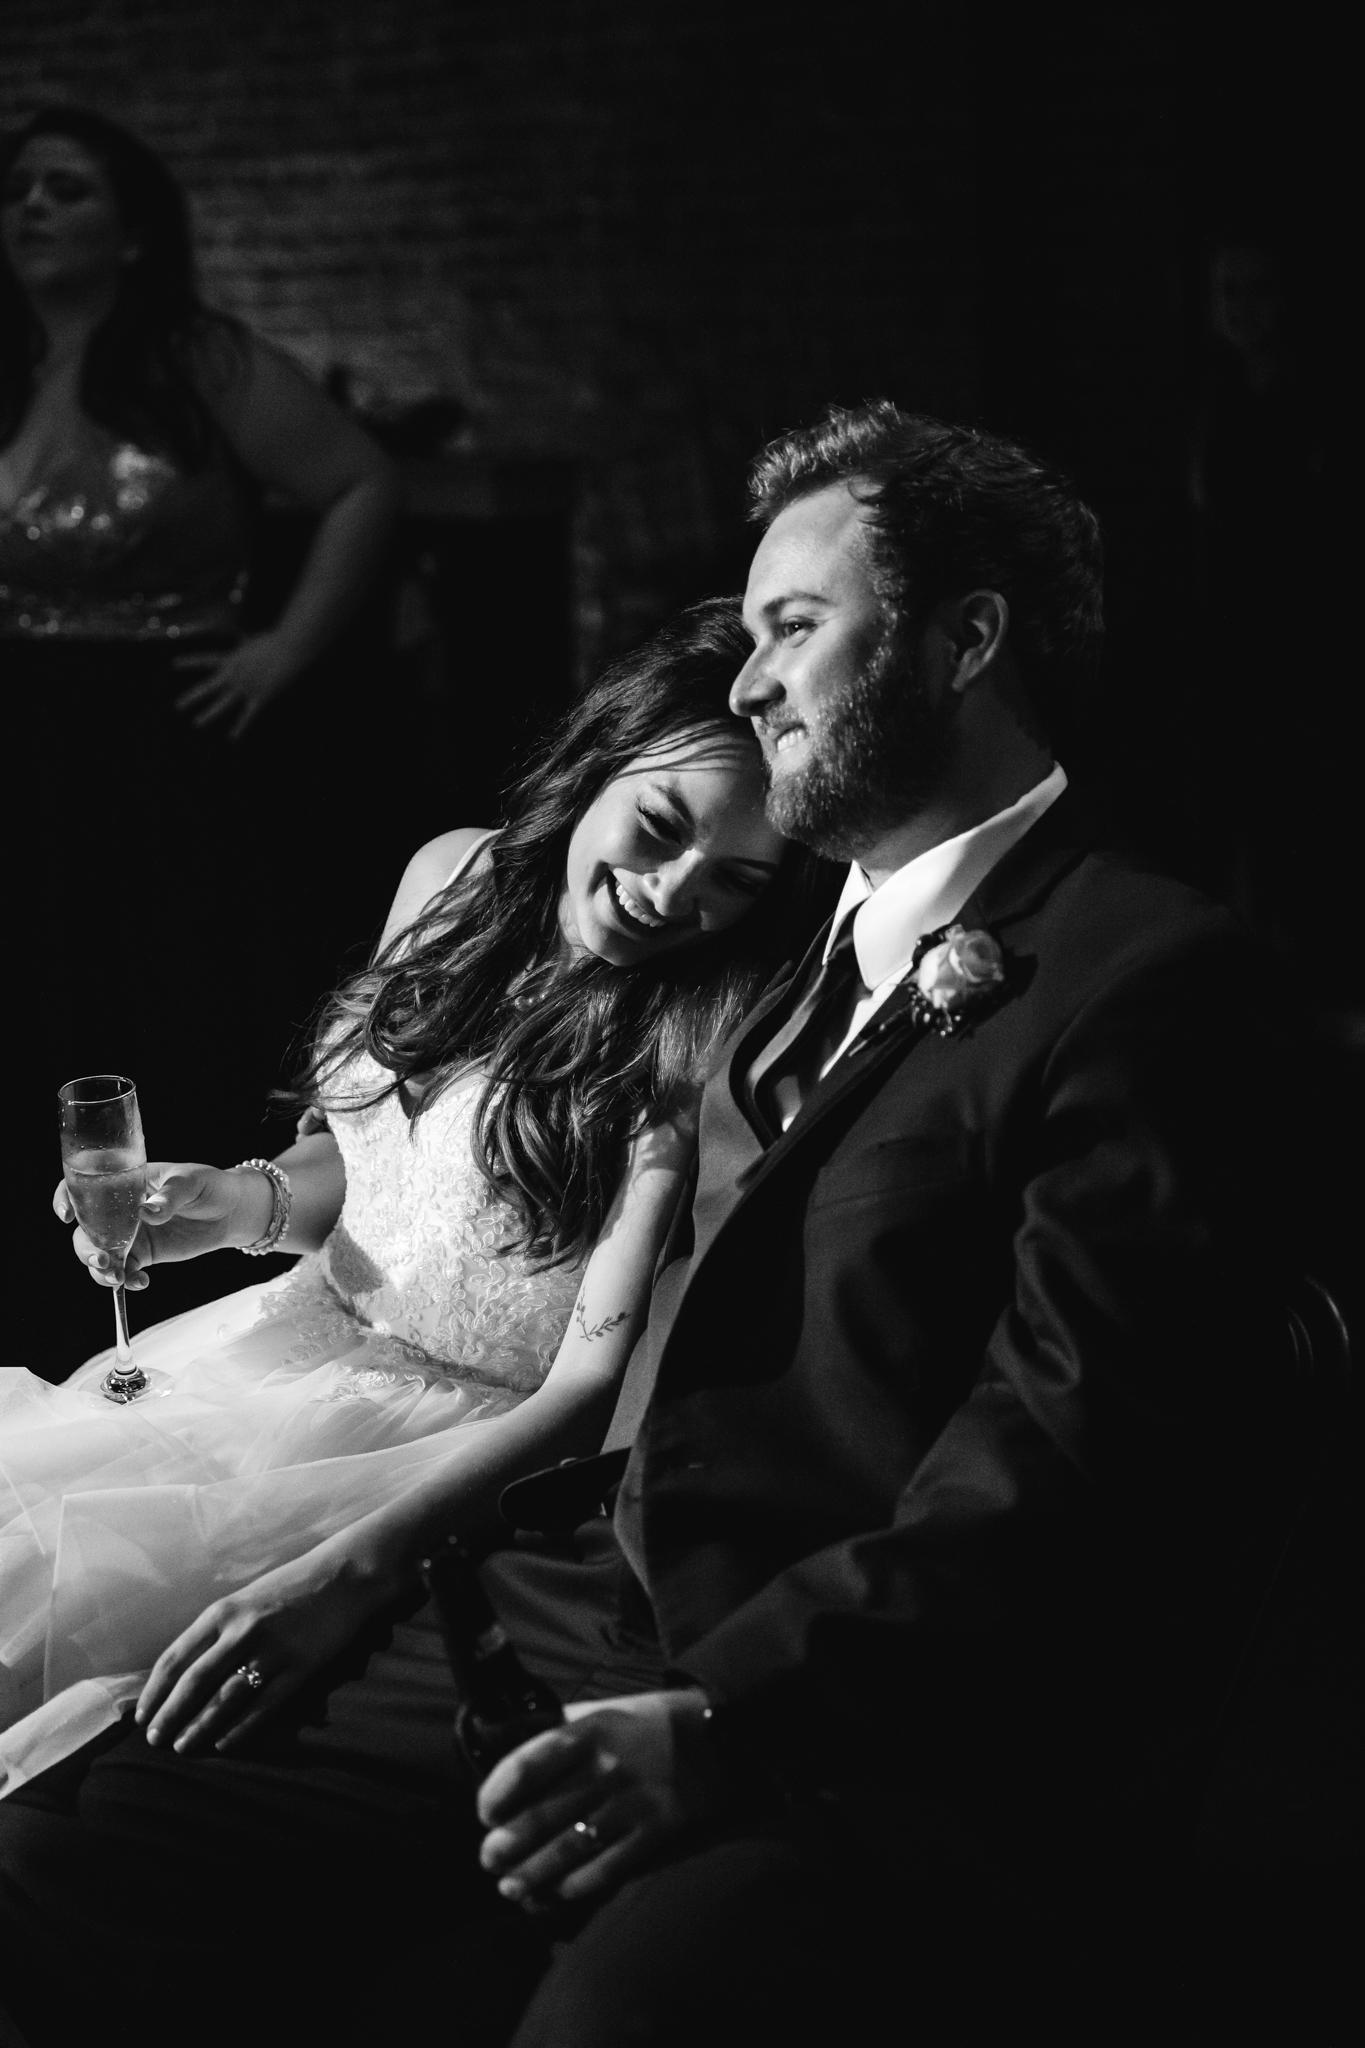 memphis-wedding-photographers-thewarmtharoundyou-ballinese-ballroom (213 of 232).jpg